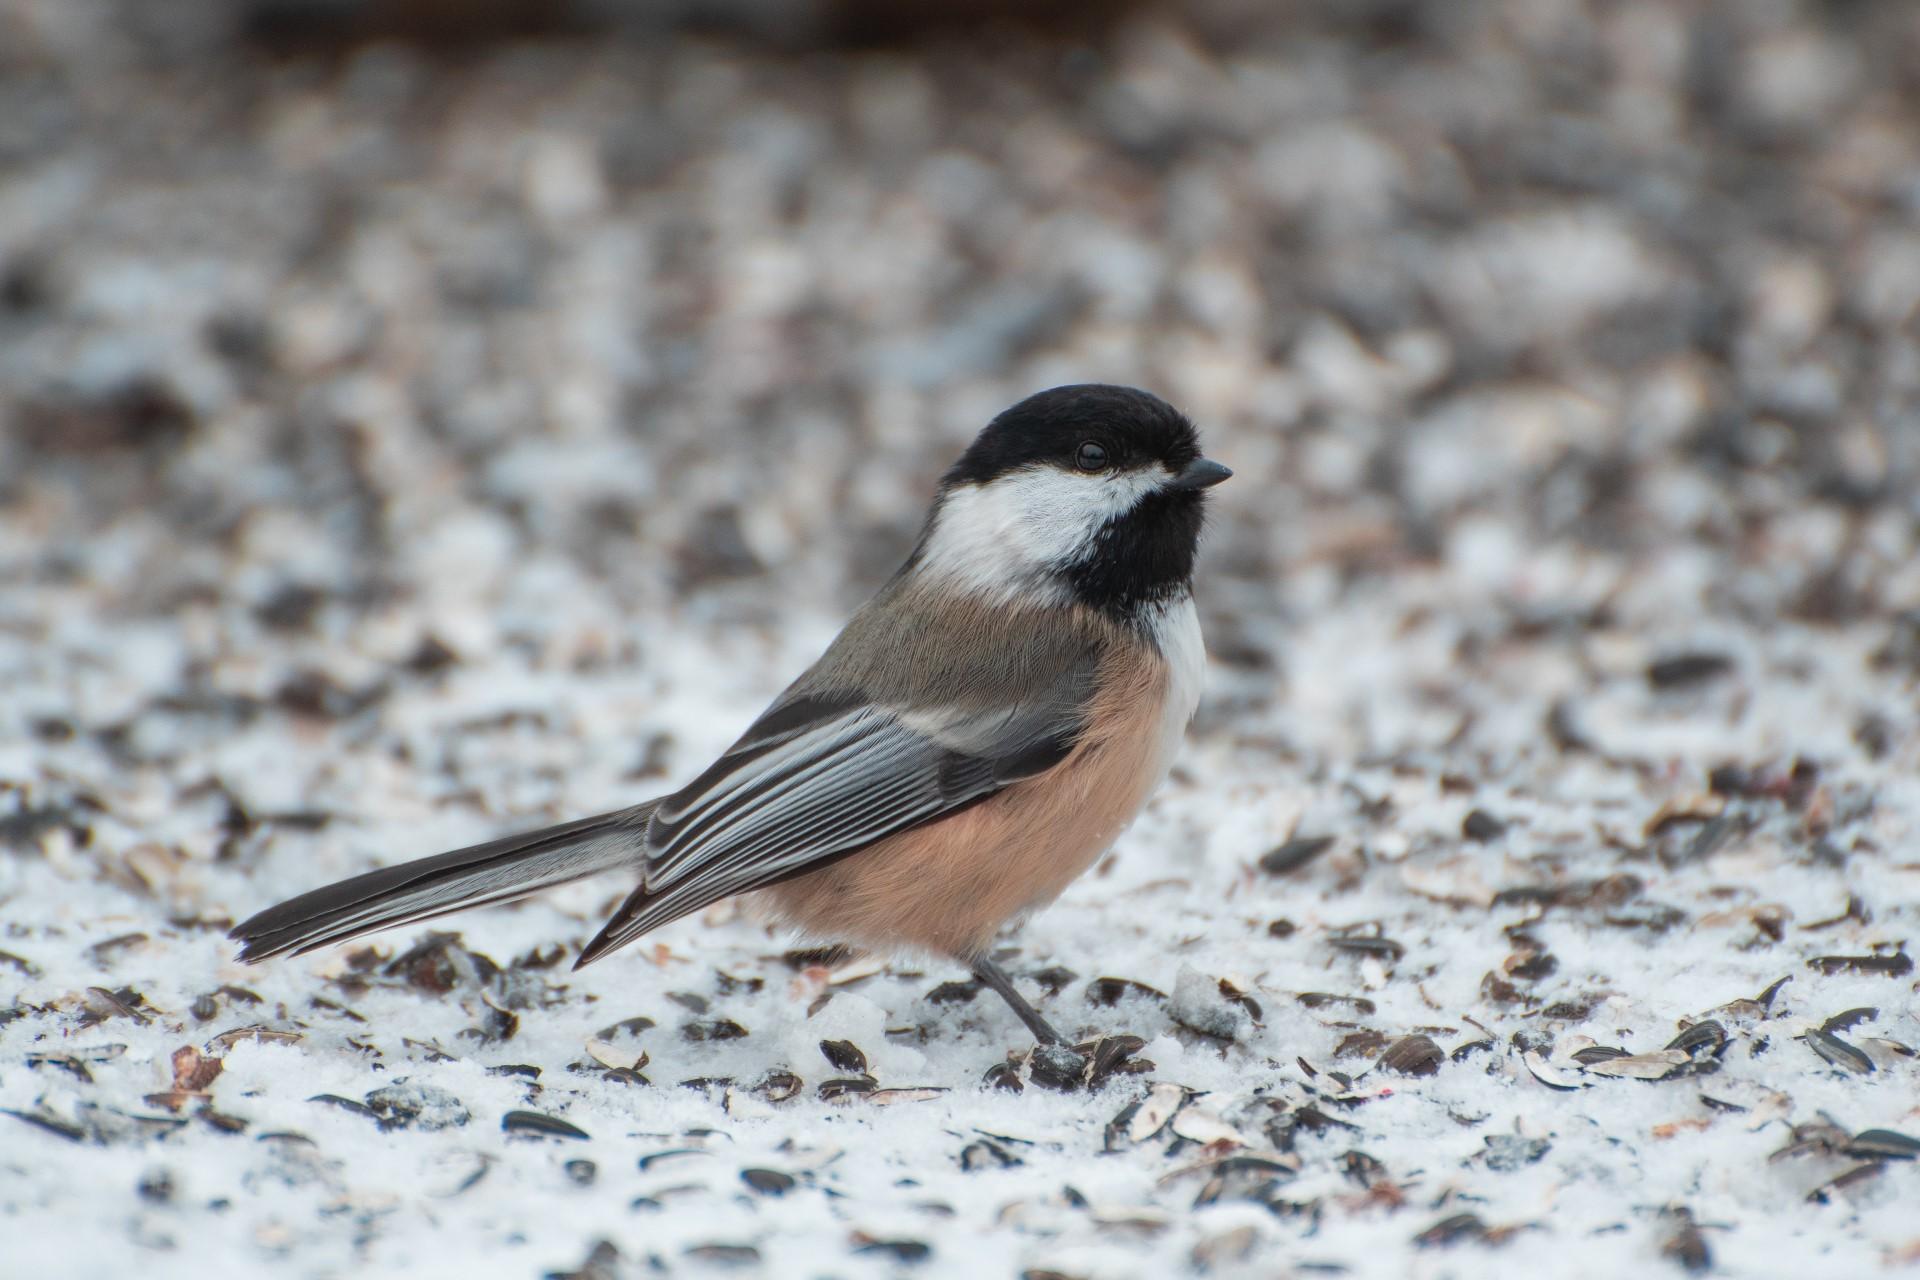 Chicago Proposes Bird-Friendly Ordinance